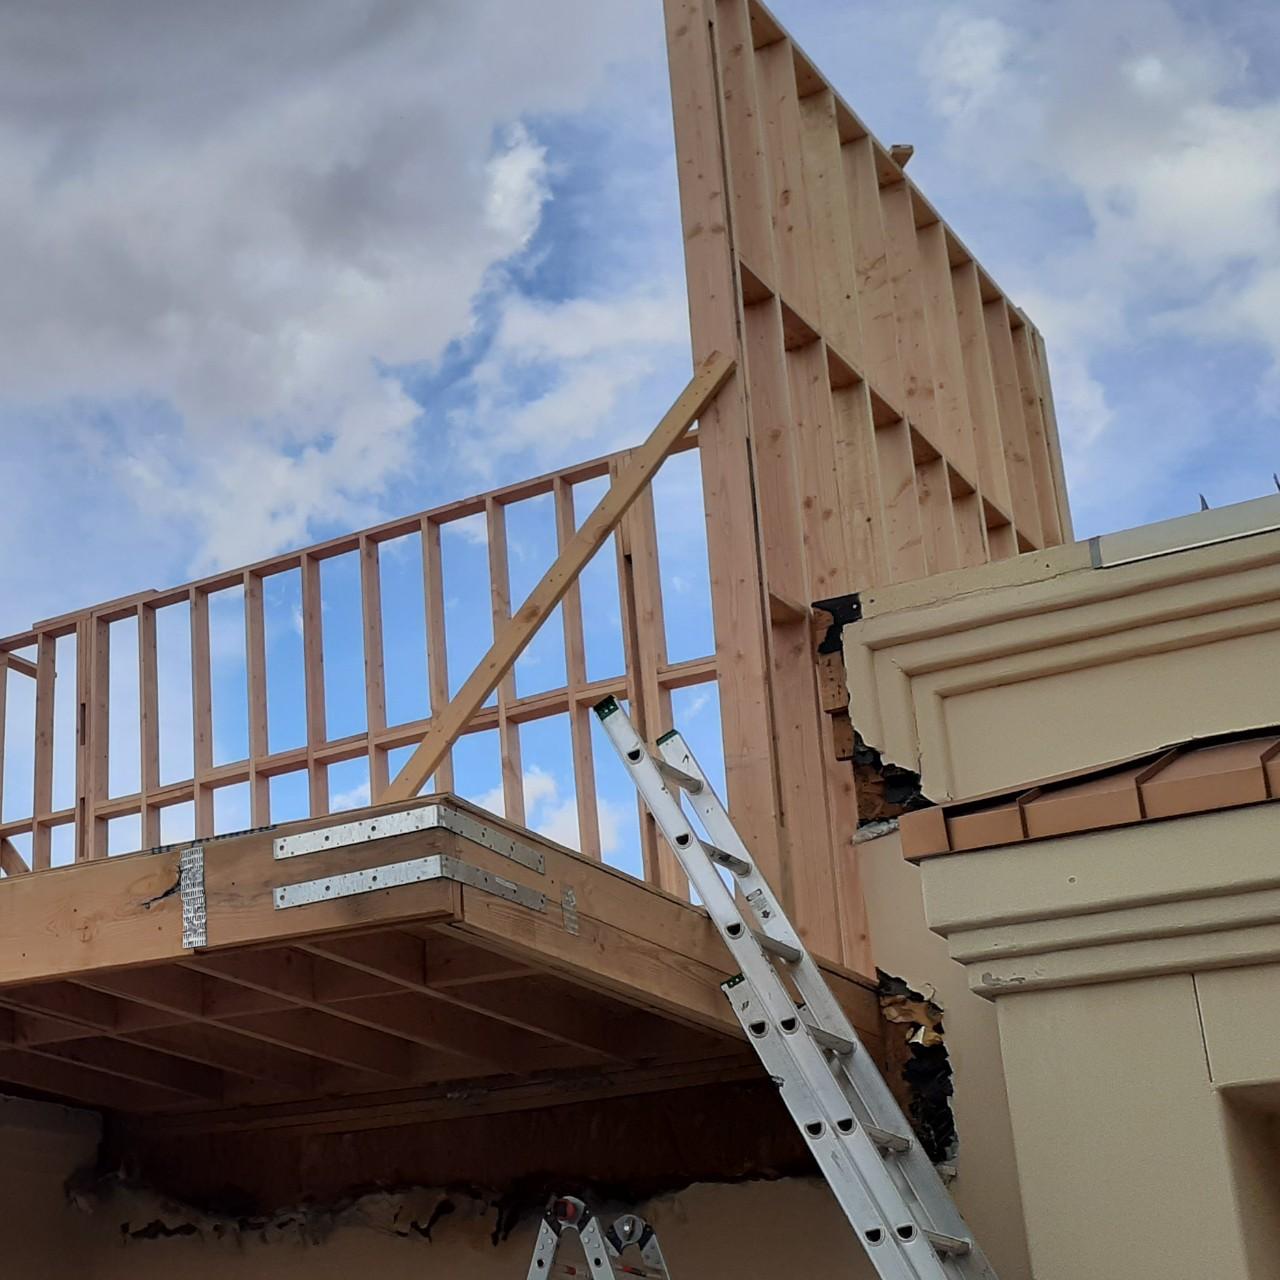 carpentry-wood-framing-second-floor-home-addition--framing-86